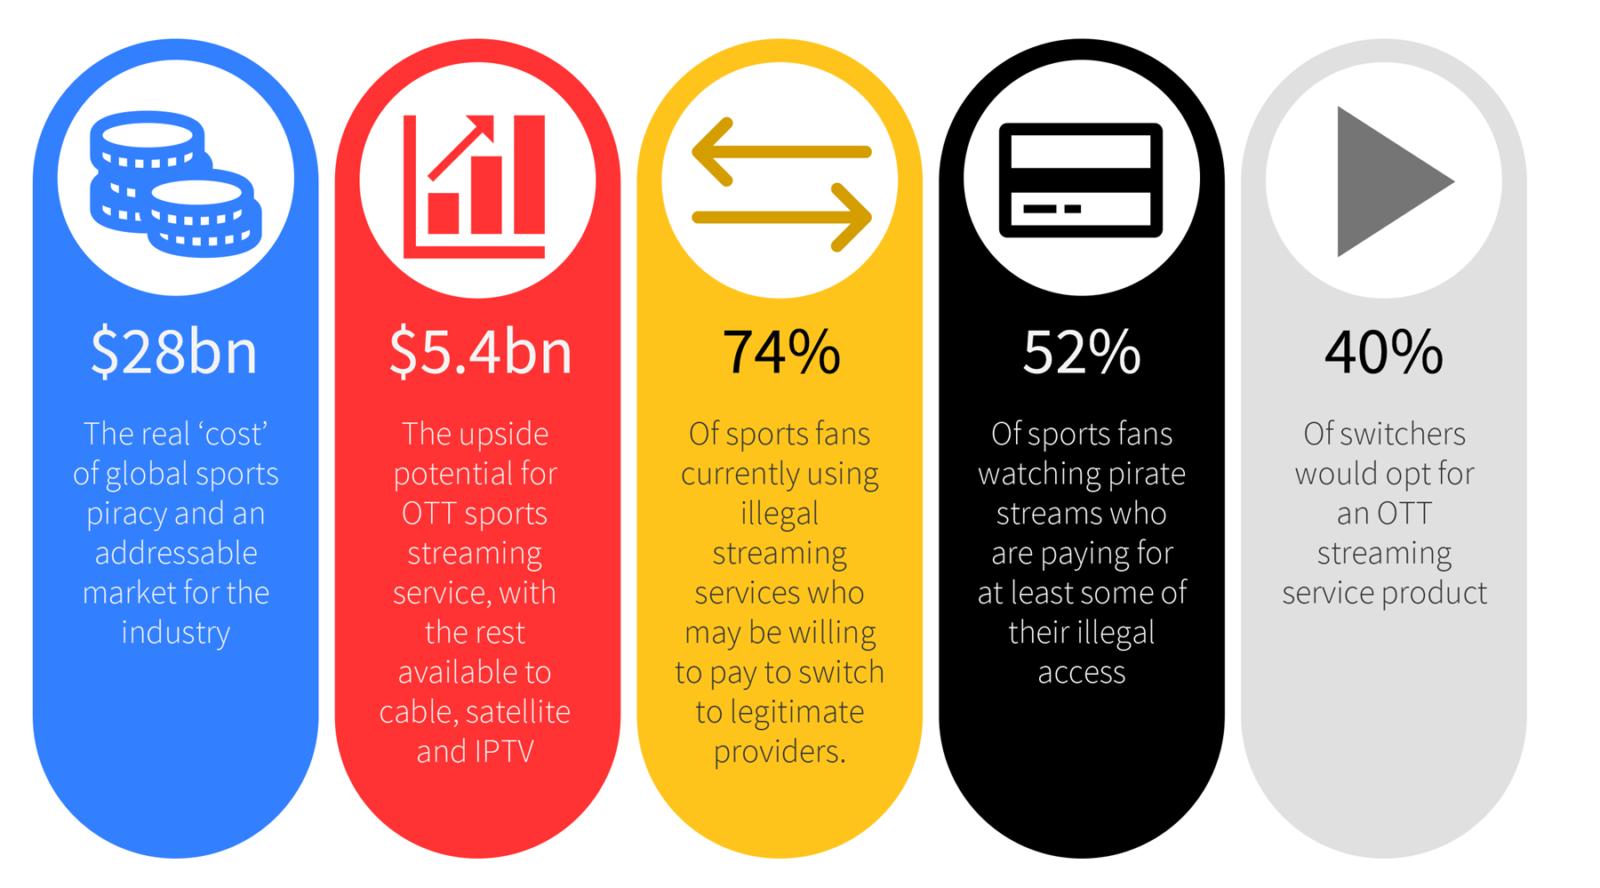 Piracy statistics by Syna Media